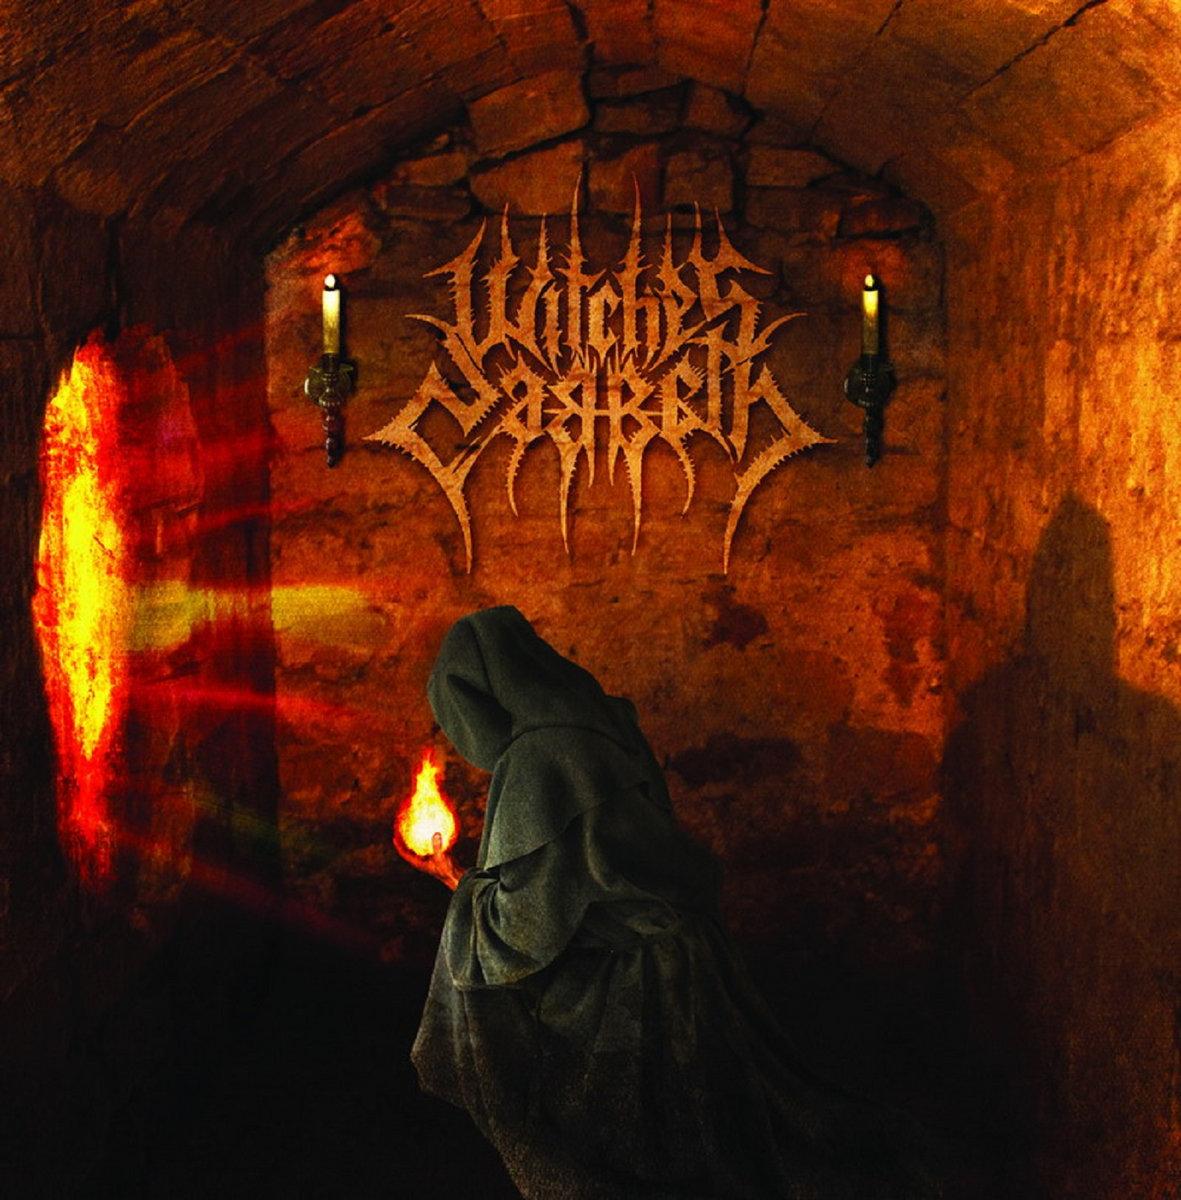 WITCHES' SABBATH (ESP)